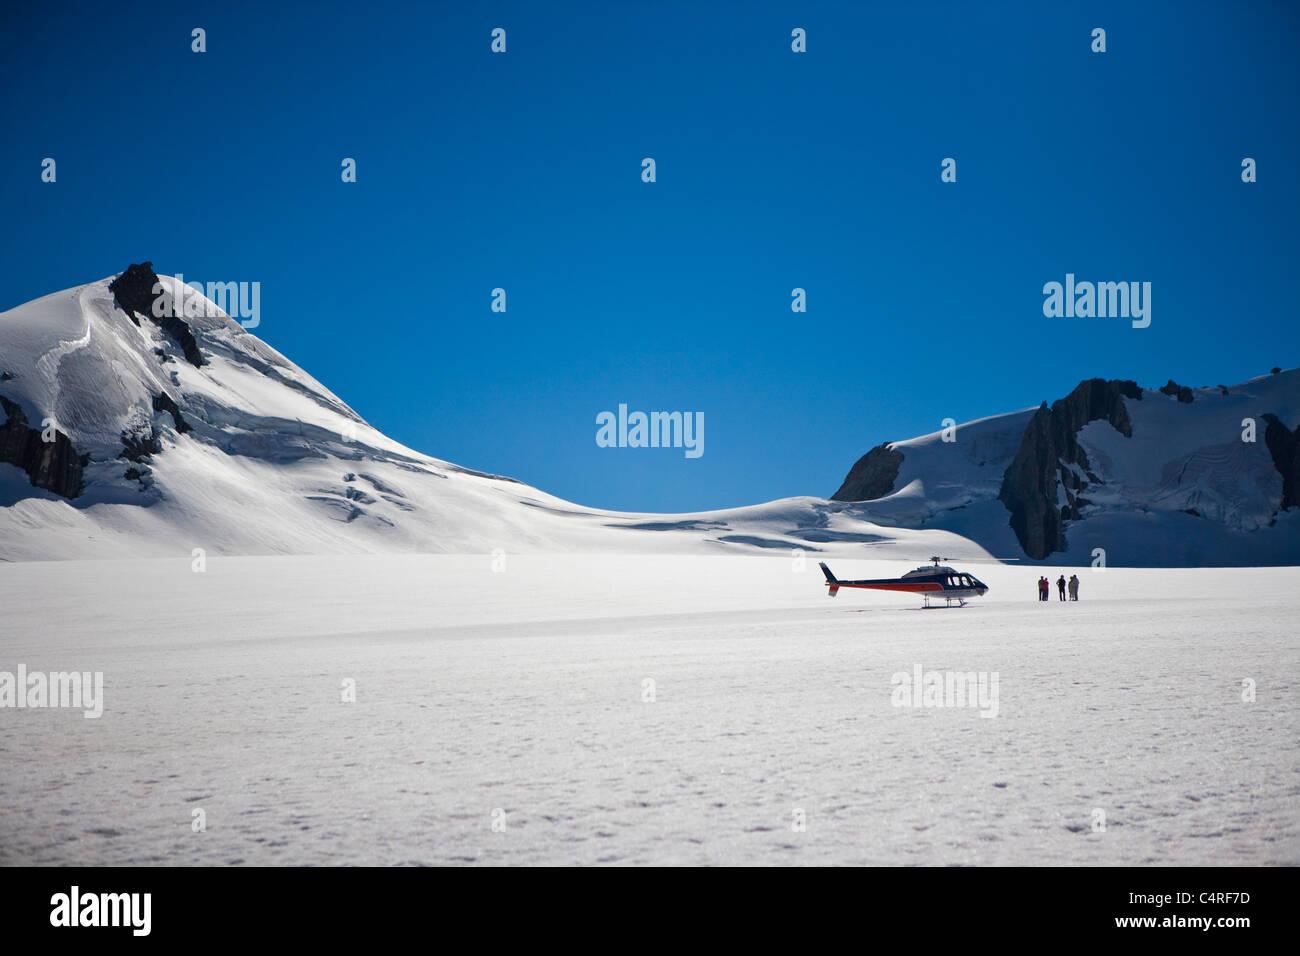 Heli hiking on Franz Josef glacier, South Island, New Zealand - Stock Image